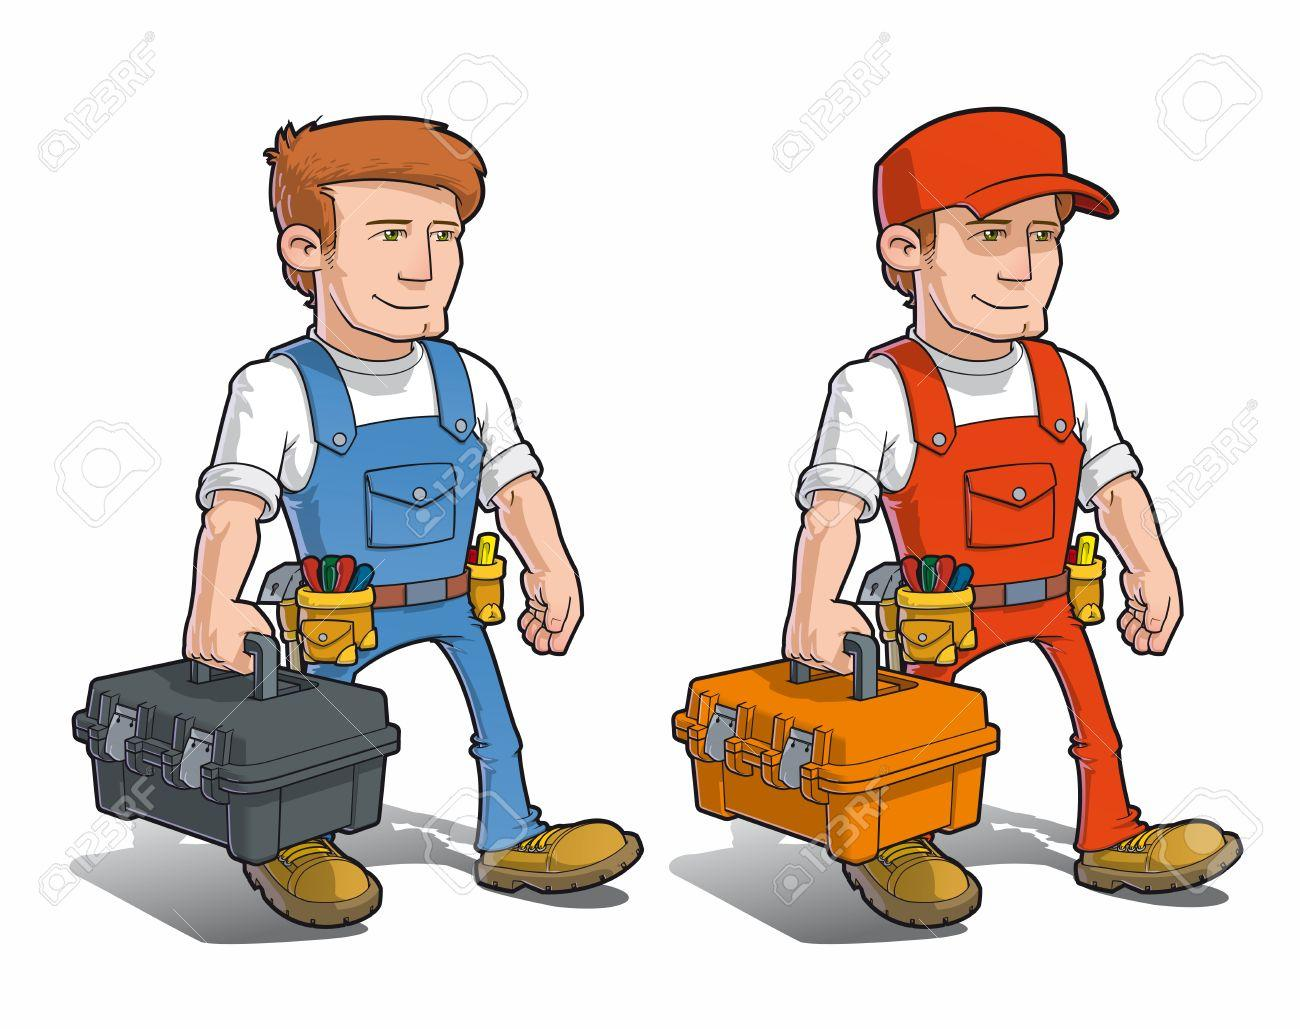 Handyman - Carying Toolkit